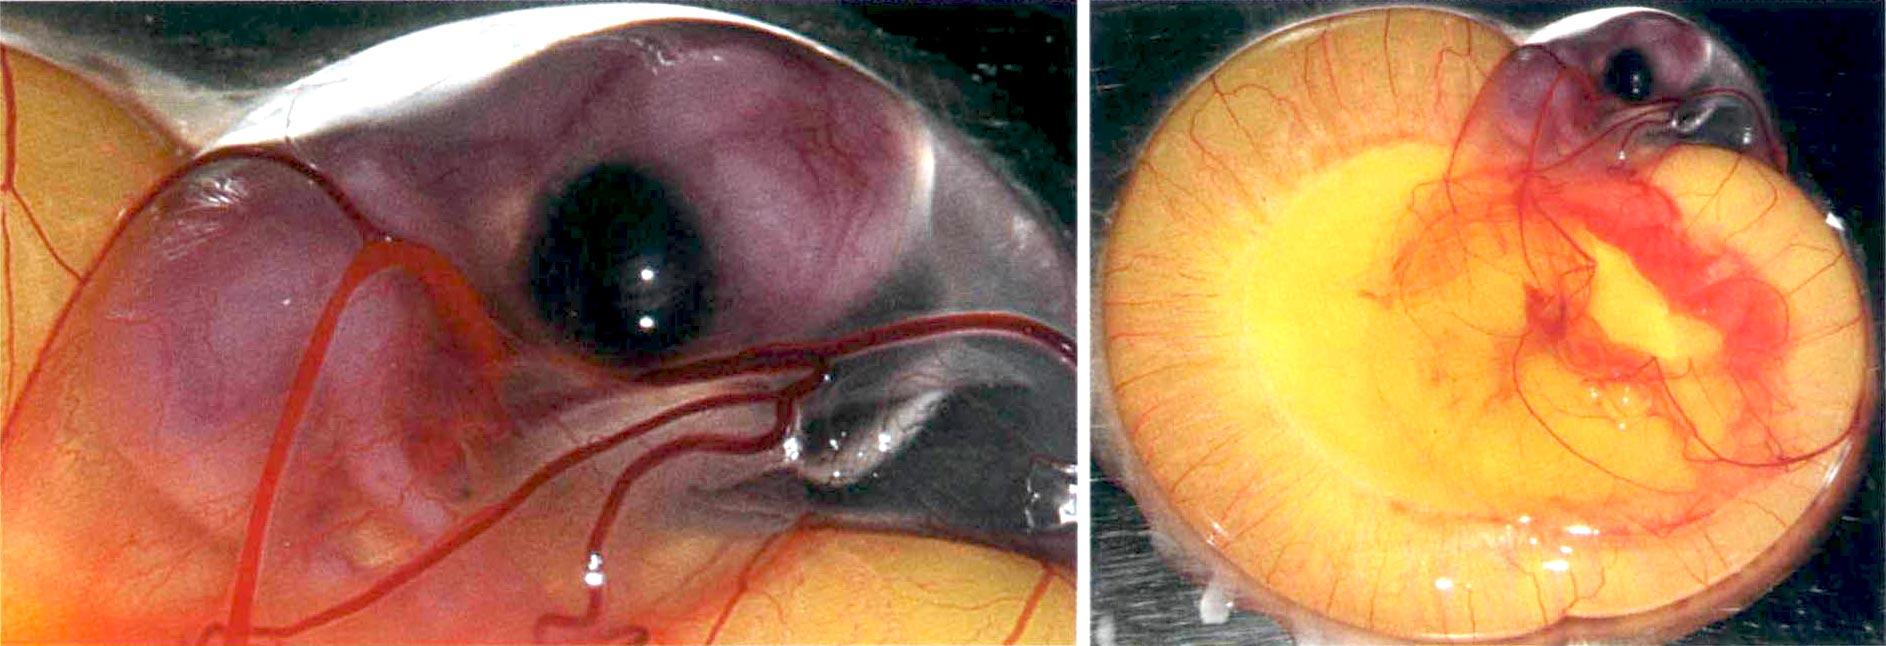 Chick embryo